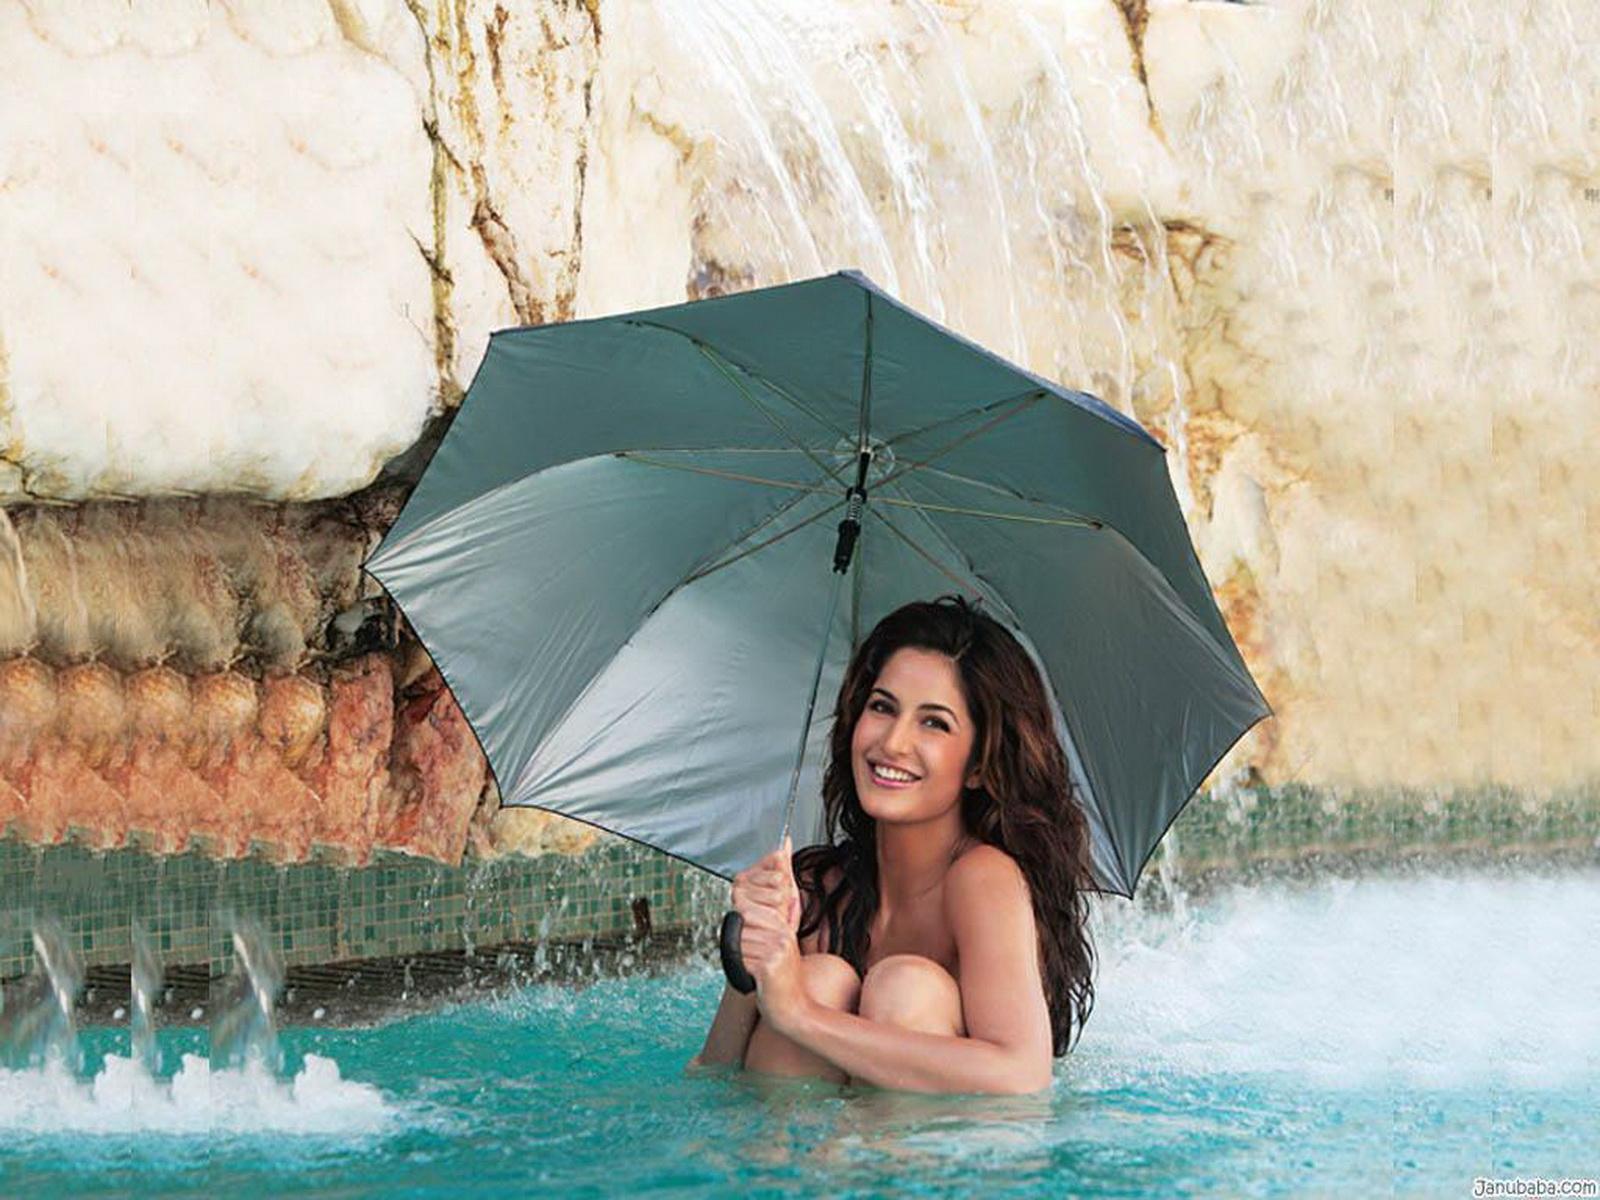 http://3.bp.blogspot.com/-wPE7i8lhcIA/UTdFu0A_R8I/AAAAAAAABVI/sVCxvTL259w/s1600/Bollywood-Actress-Katrina-Bold-Picture.jpg